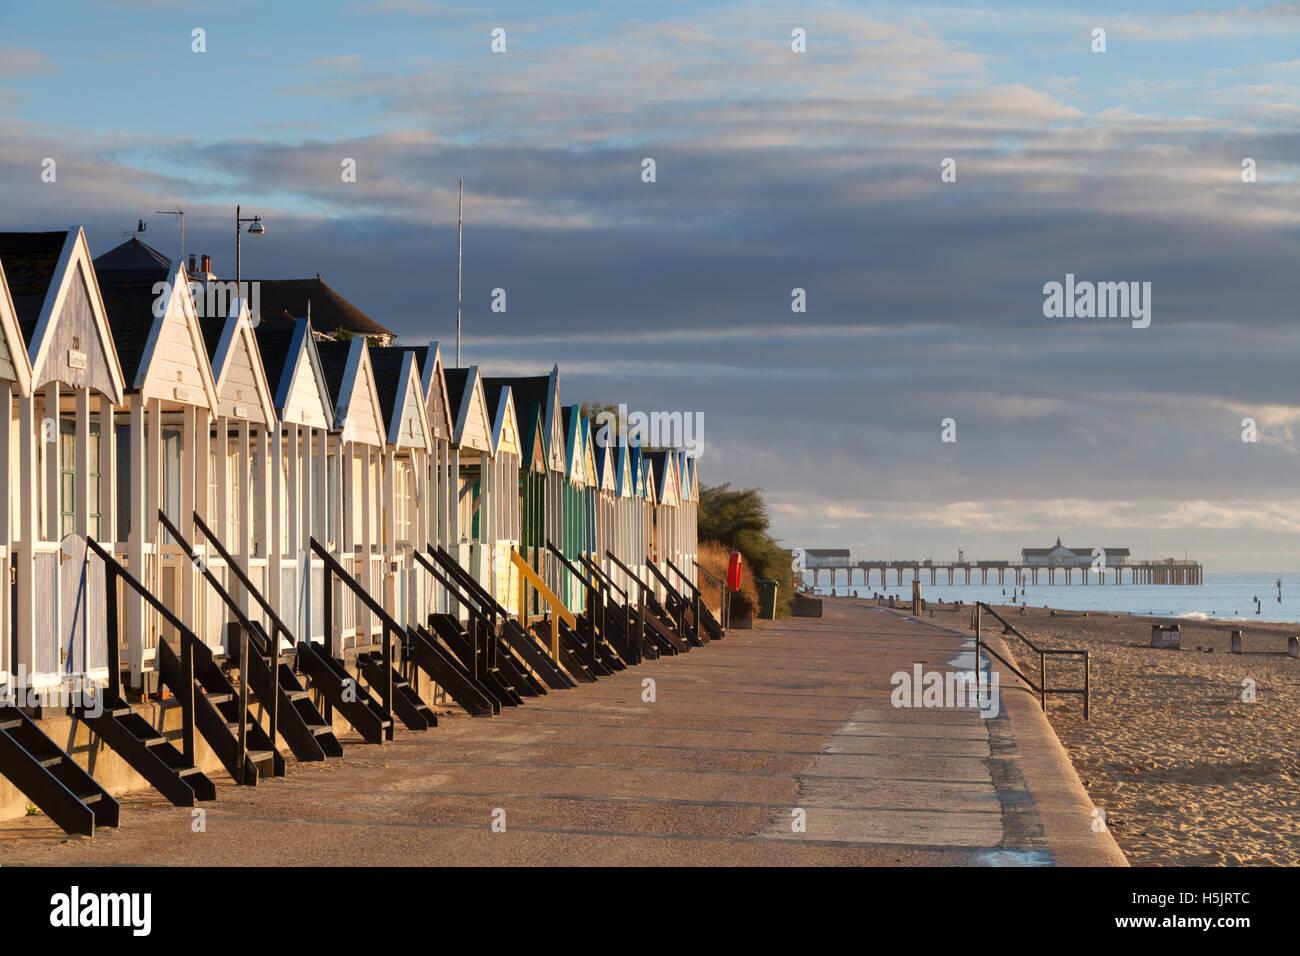 Beach huts on prom Southwold Suffolk East Anglia, UK - Stock Image